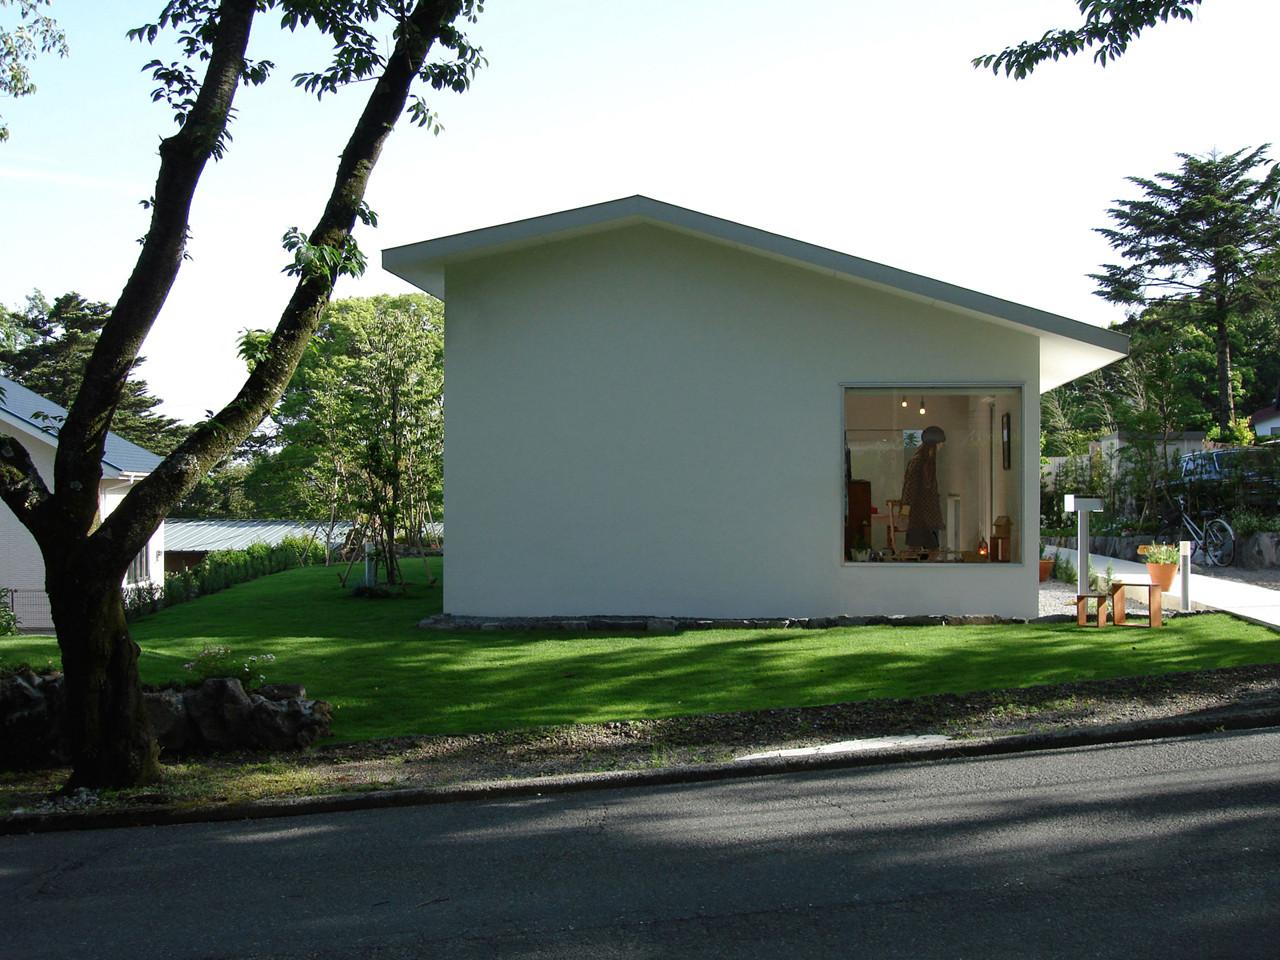 Izukougen House / Atelier Shinya Miura, Courtesy of Atelier Shinya Miura